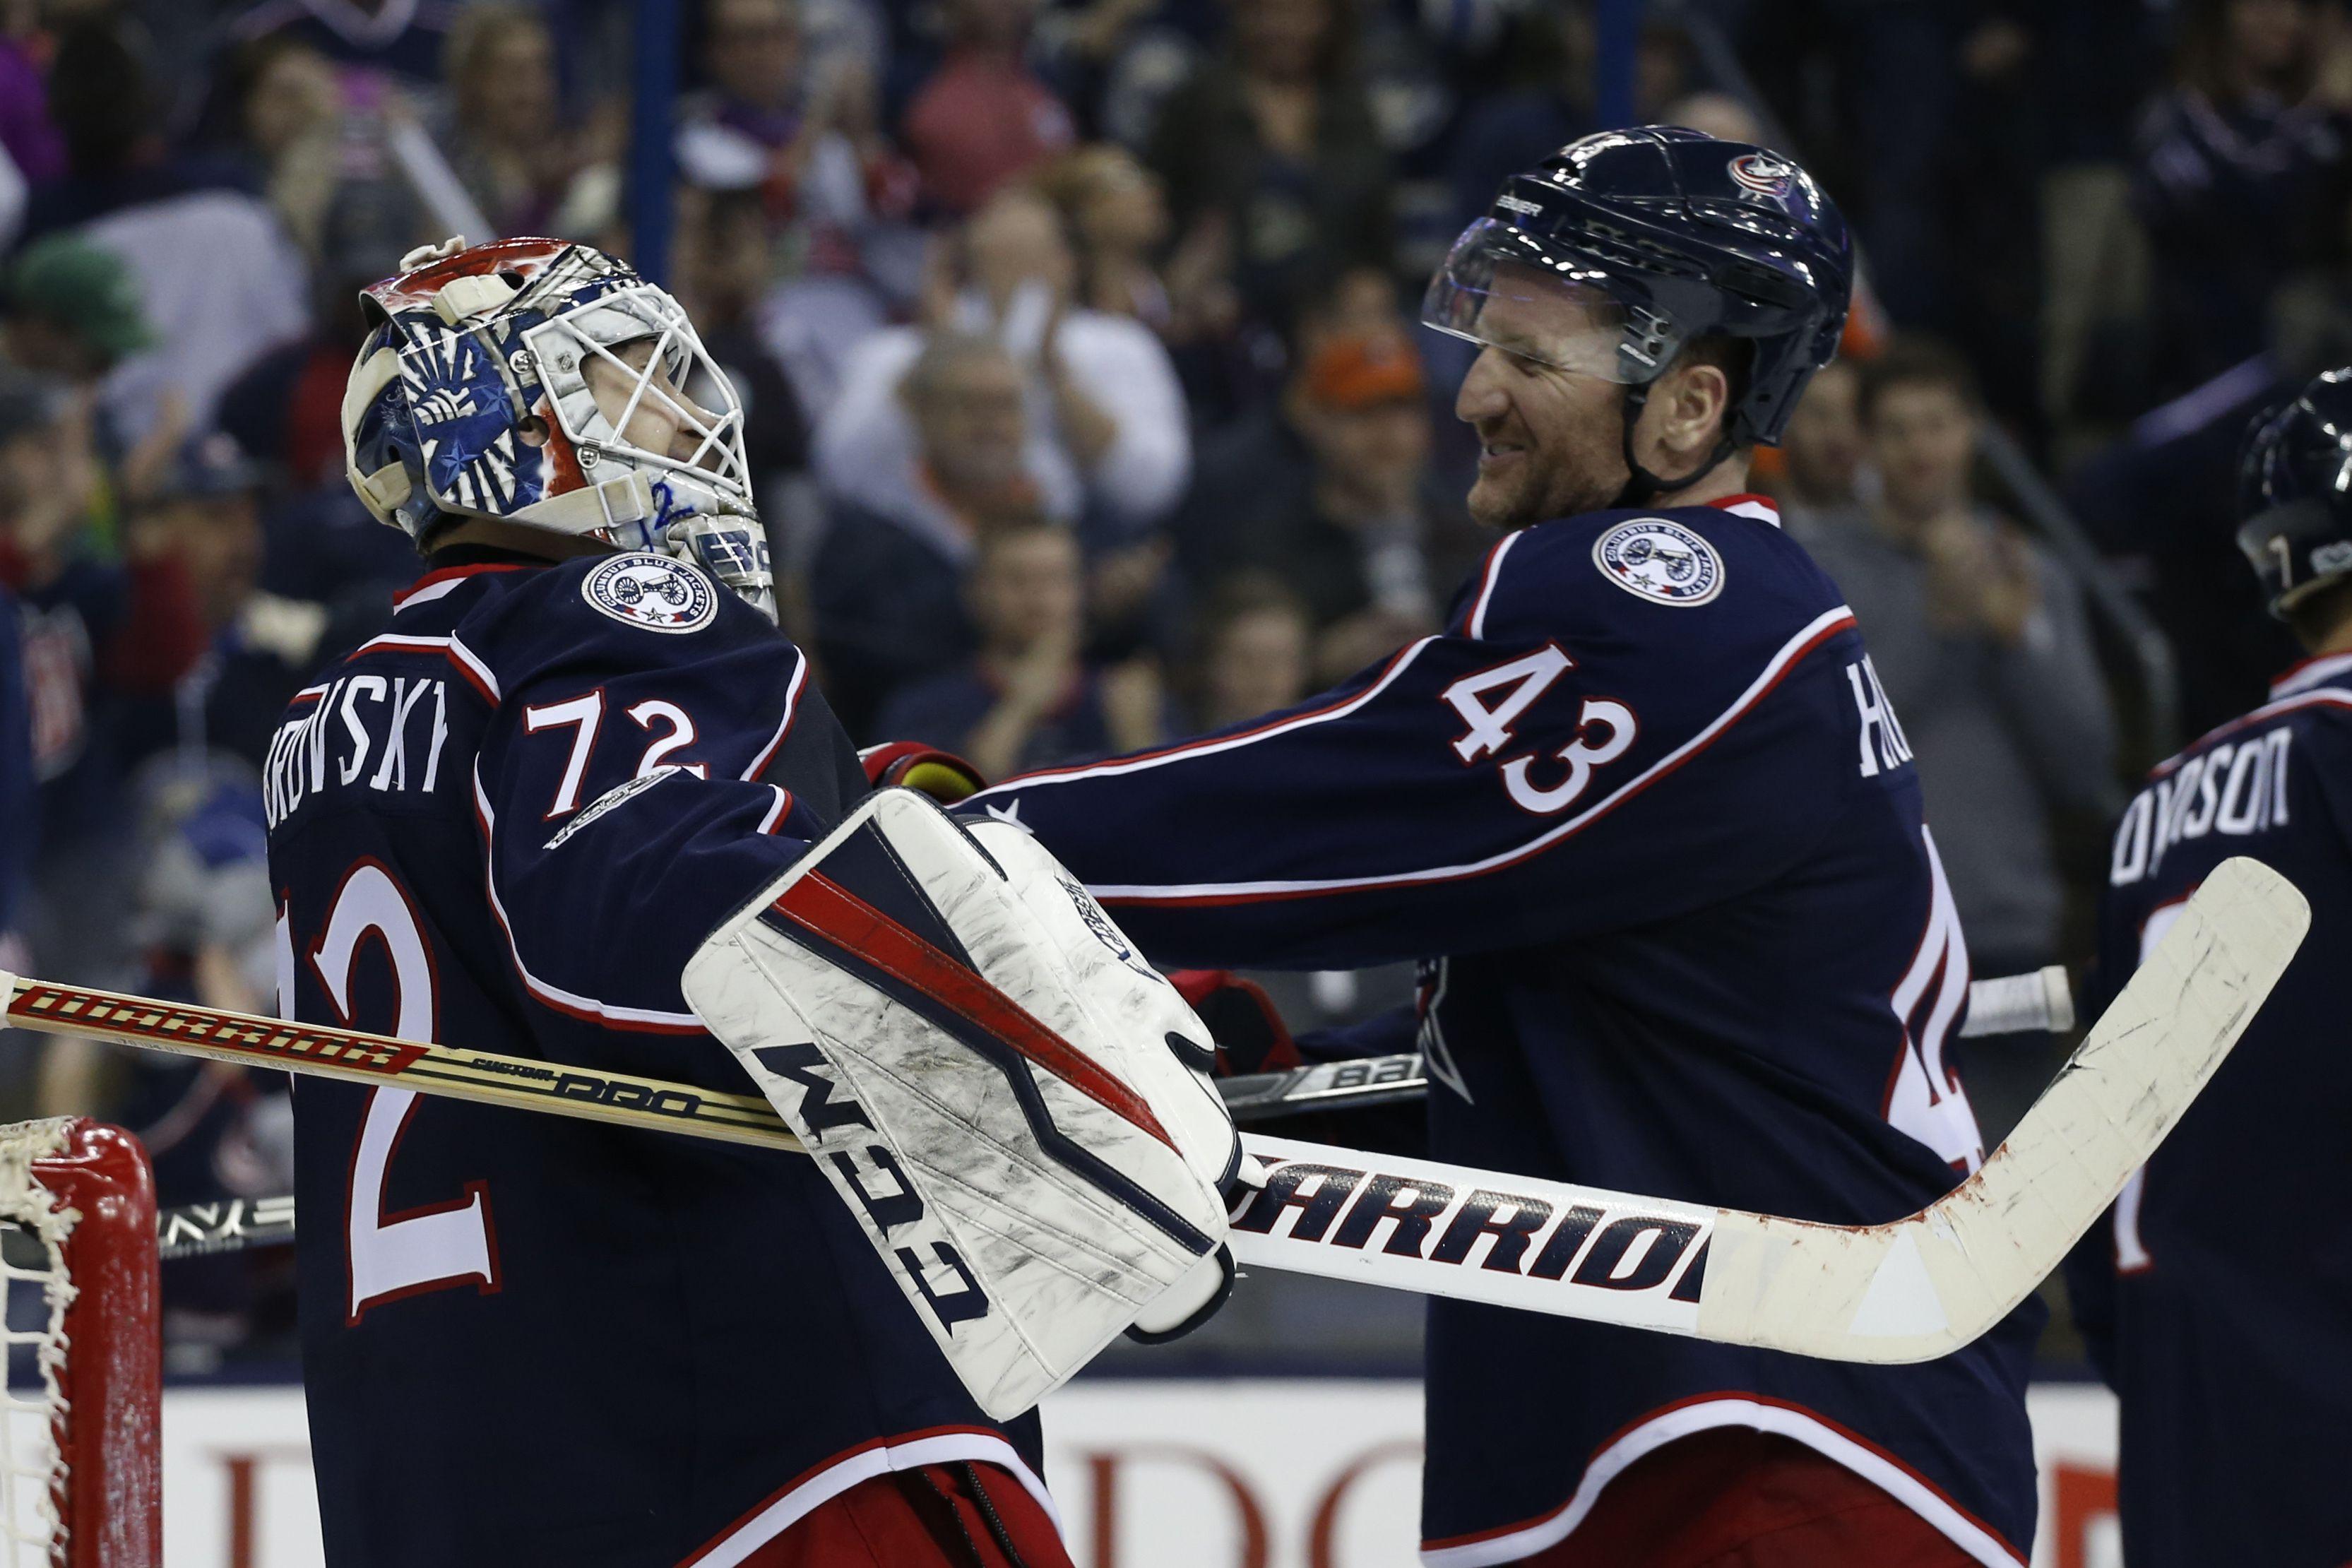 Bobrovsky Terrific Again As Blue Jackets Beat Flyers 1 0 Columbus Blue Jackets Philadelphia Flyers Scott Hartnell